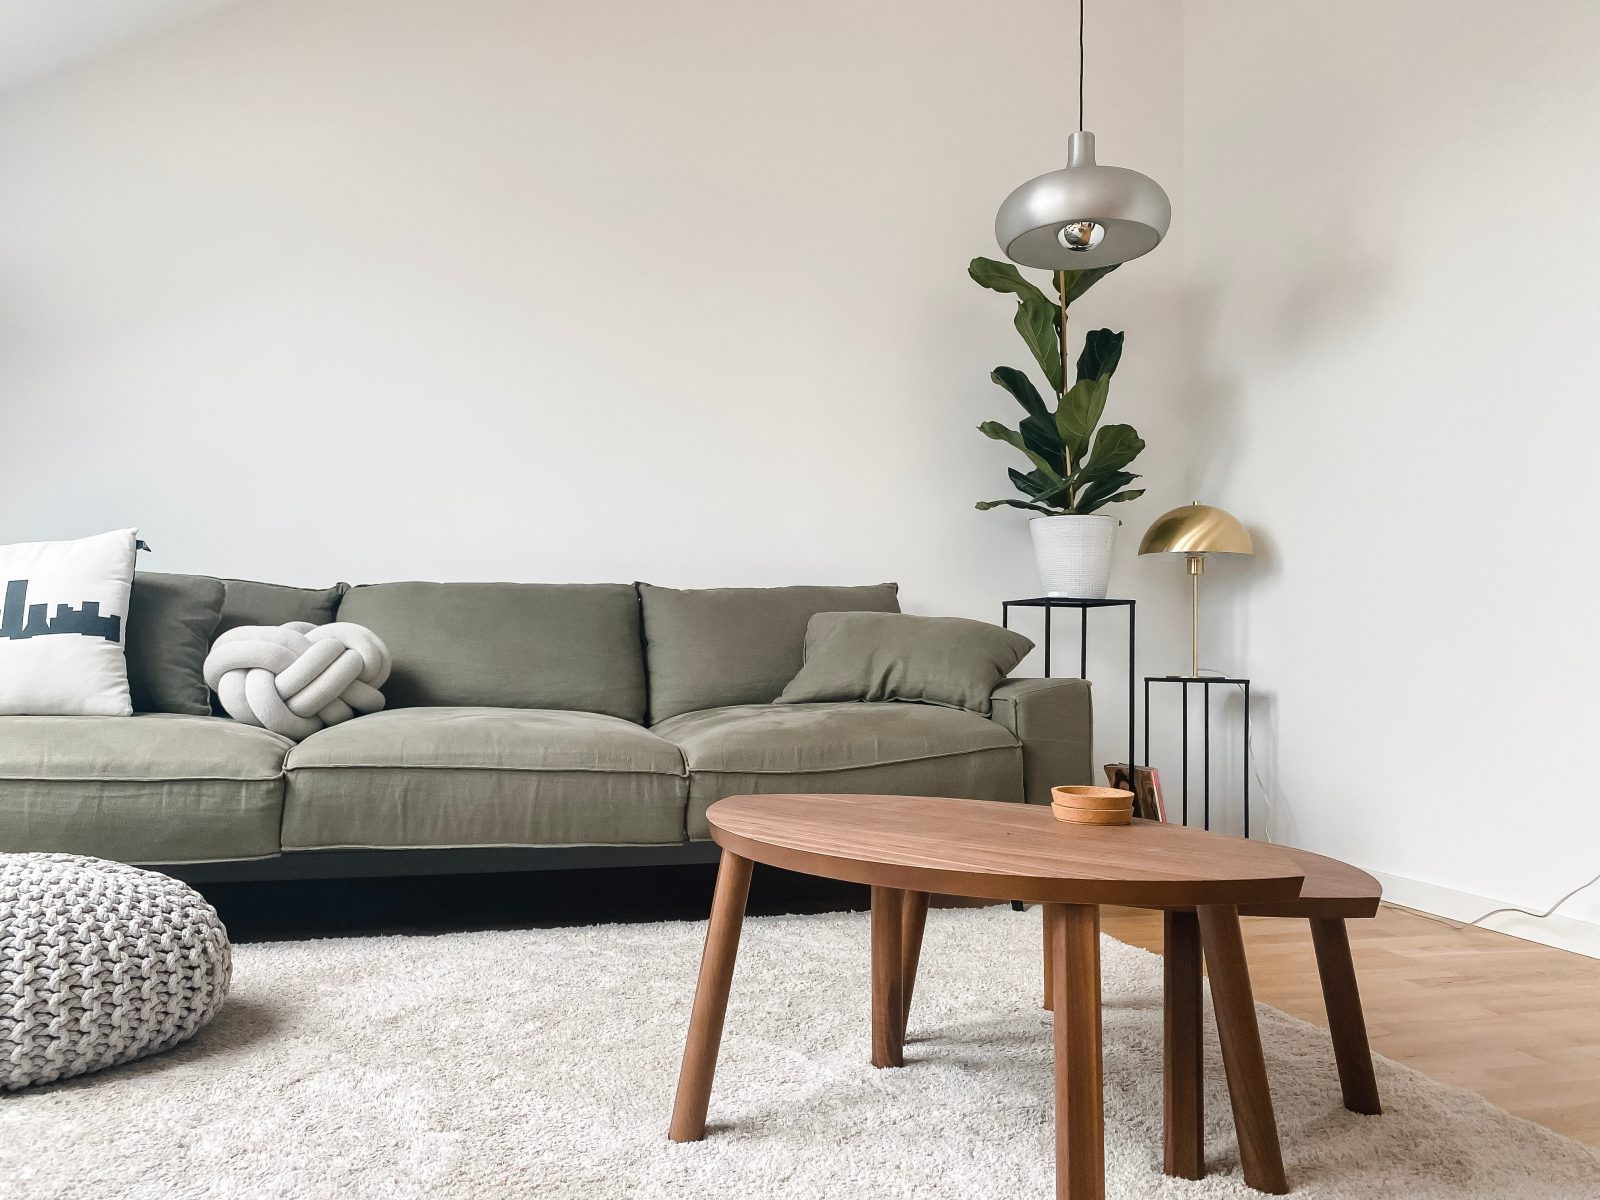 PlasmaPURE - Residential- Commercial